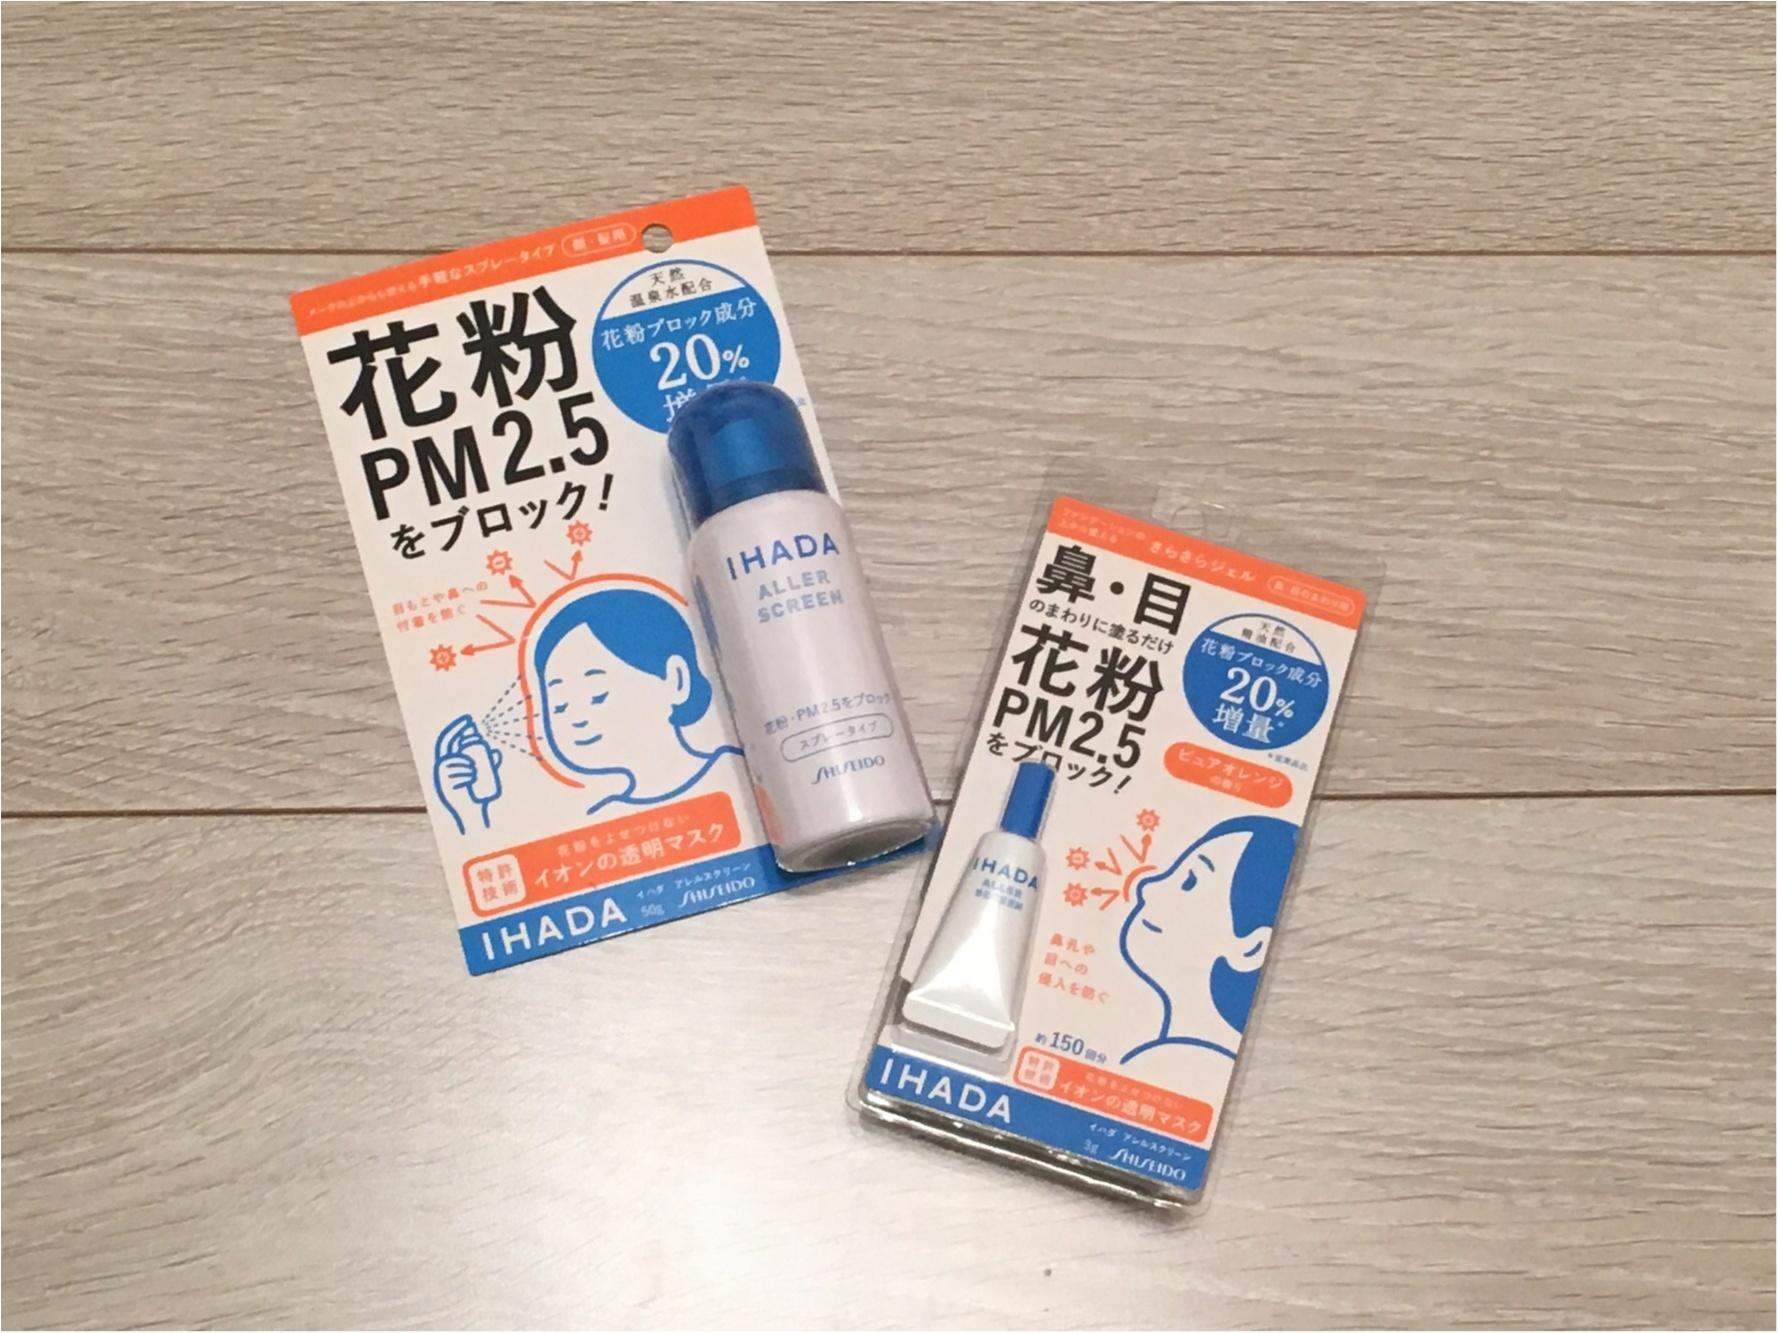 【IHADA】花粉症、PM2.5に効果的アイテム!定番スプレータイプ&持ち歩きにも便利なジェルタイプ!_1